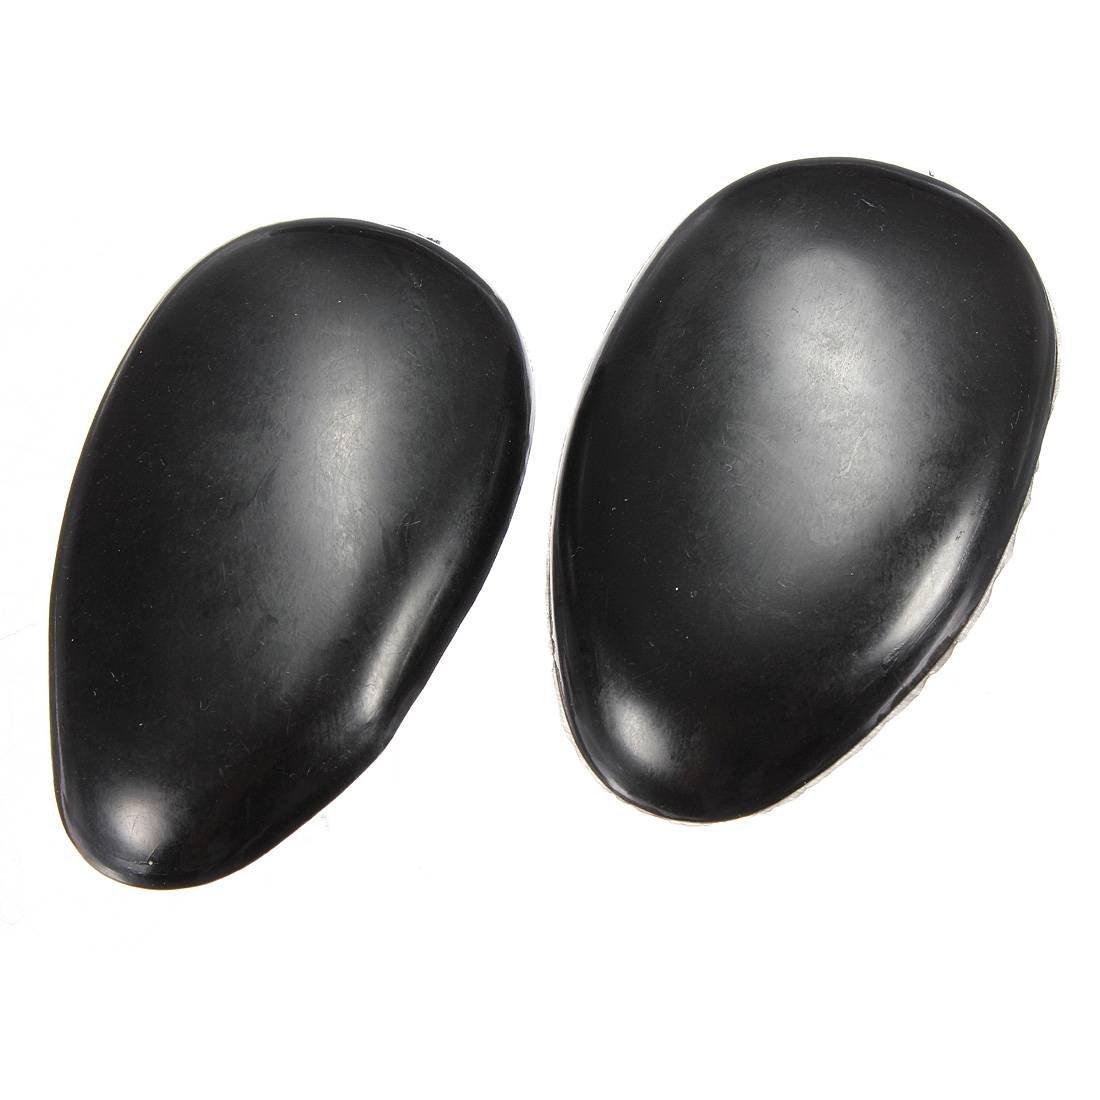 1 Pair Black Plastic Hair Dye Color Coloring Ear Cover WS ...